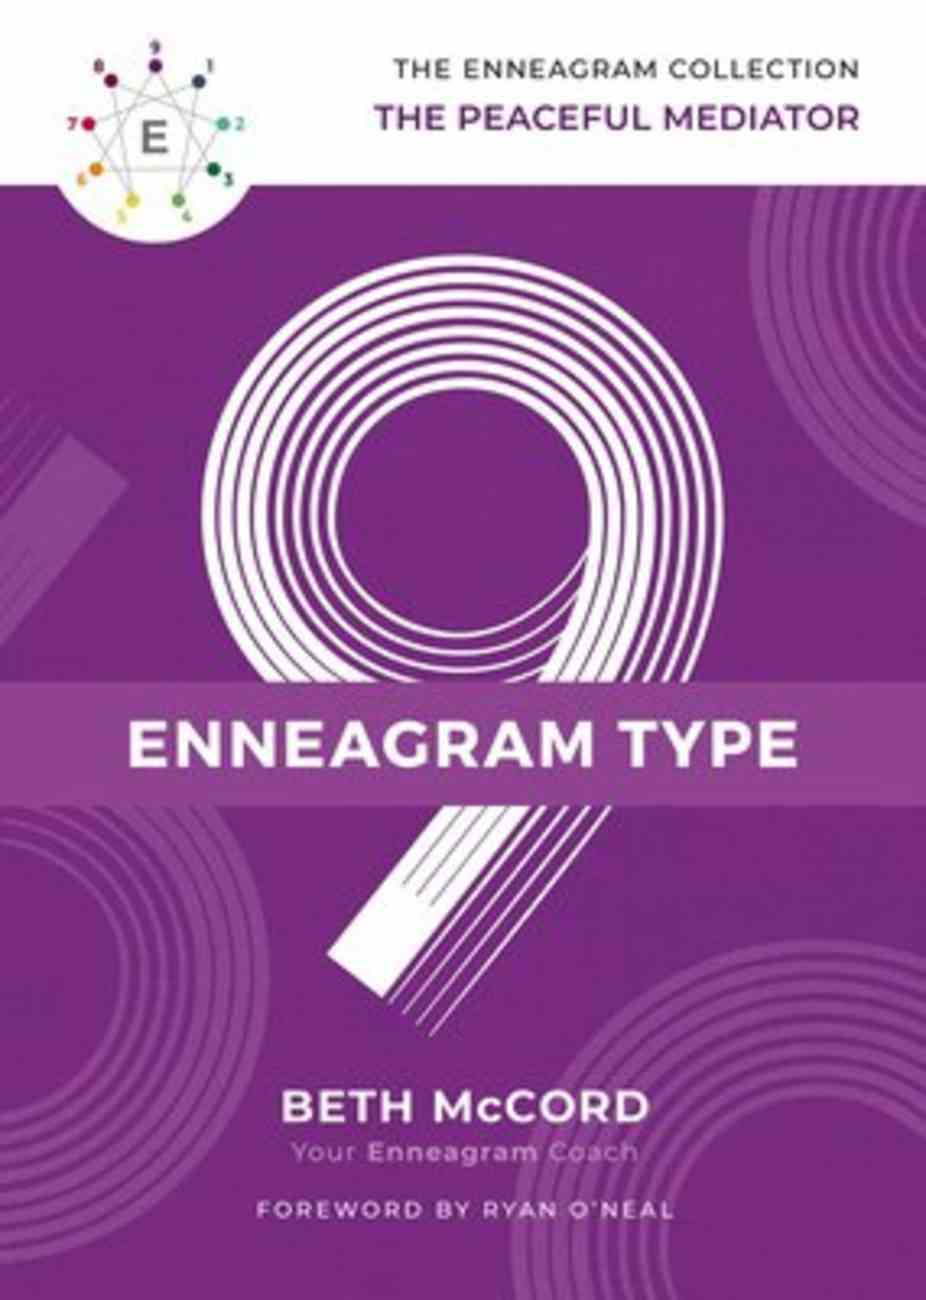 The Enneagram Type 9 (Enneagram Collection) eBook